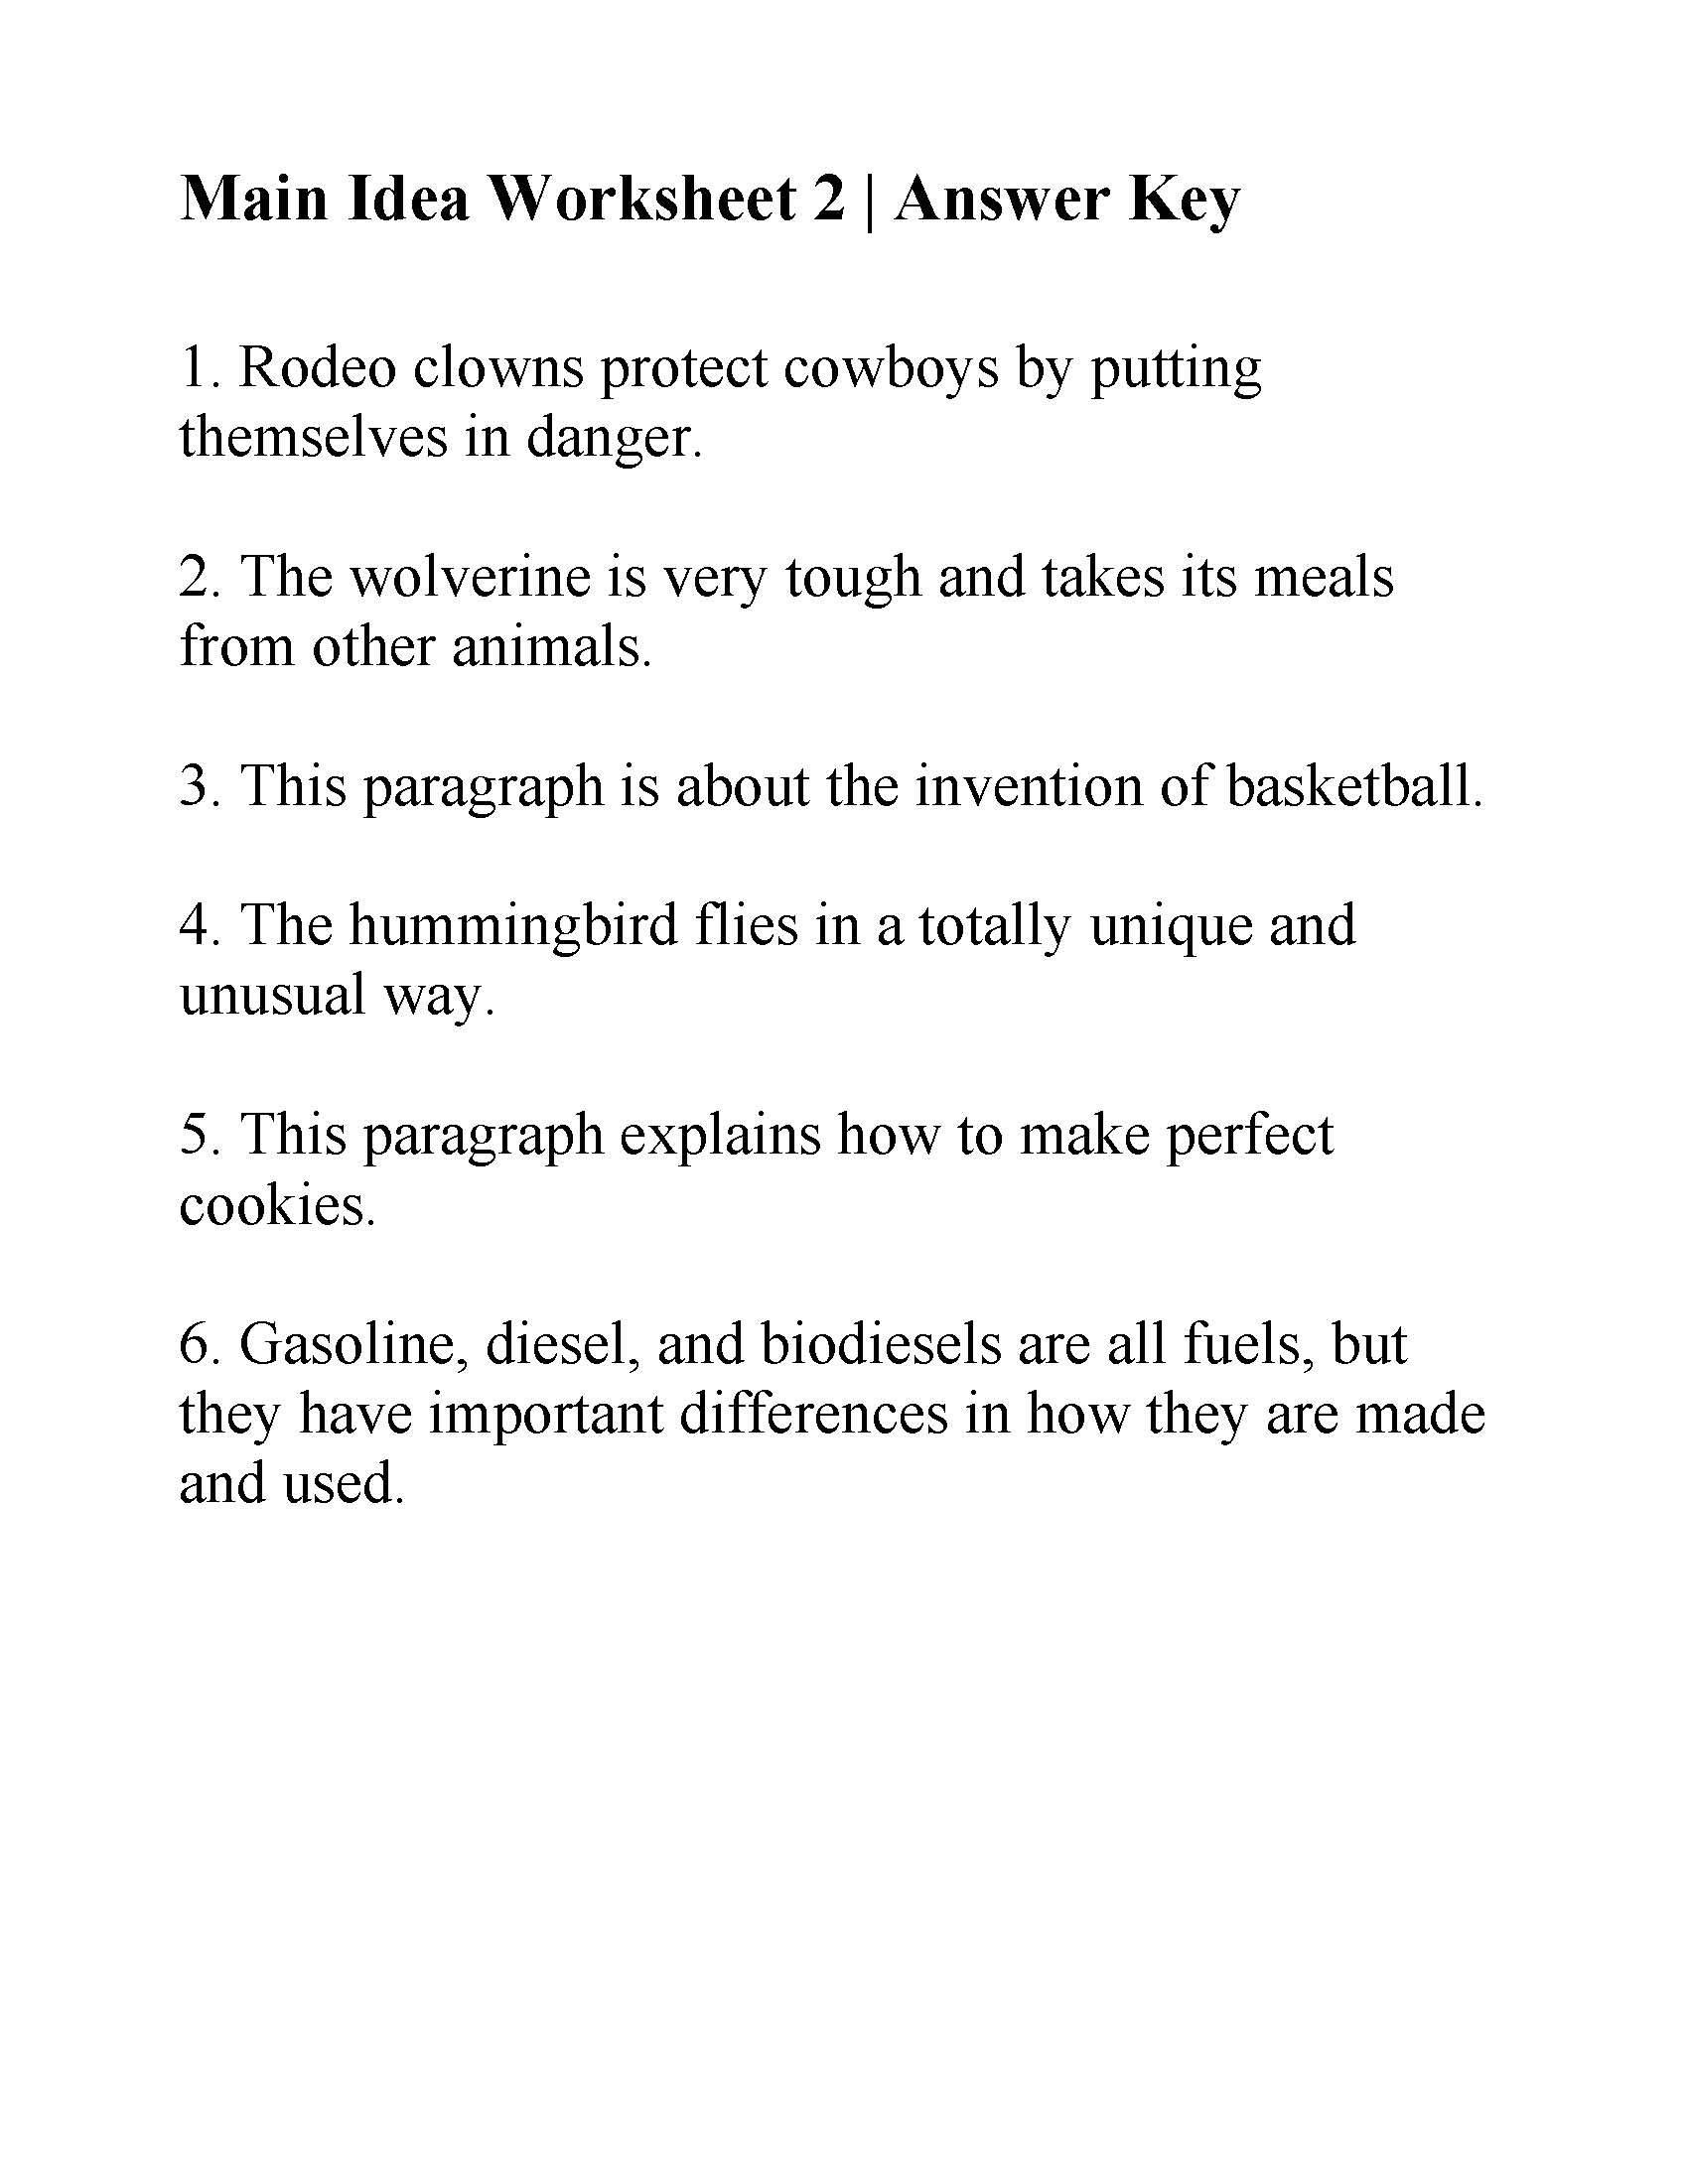 Main Idea Worksheets Third Grade 4 Free Grammar Worksheets Third Grade 3 Capitalization